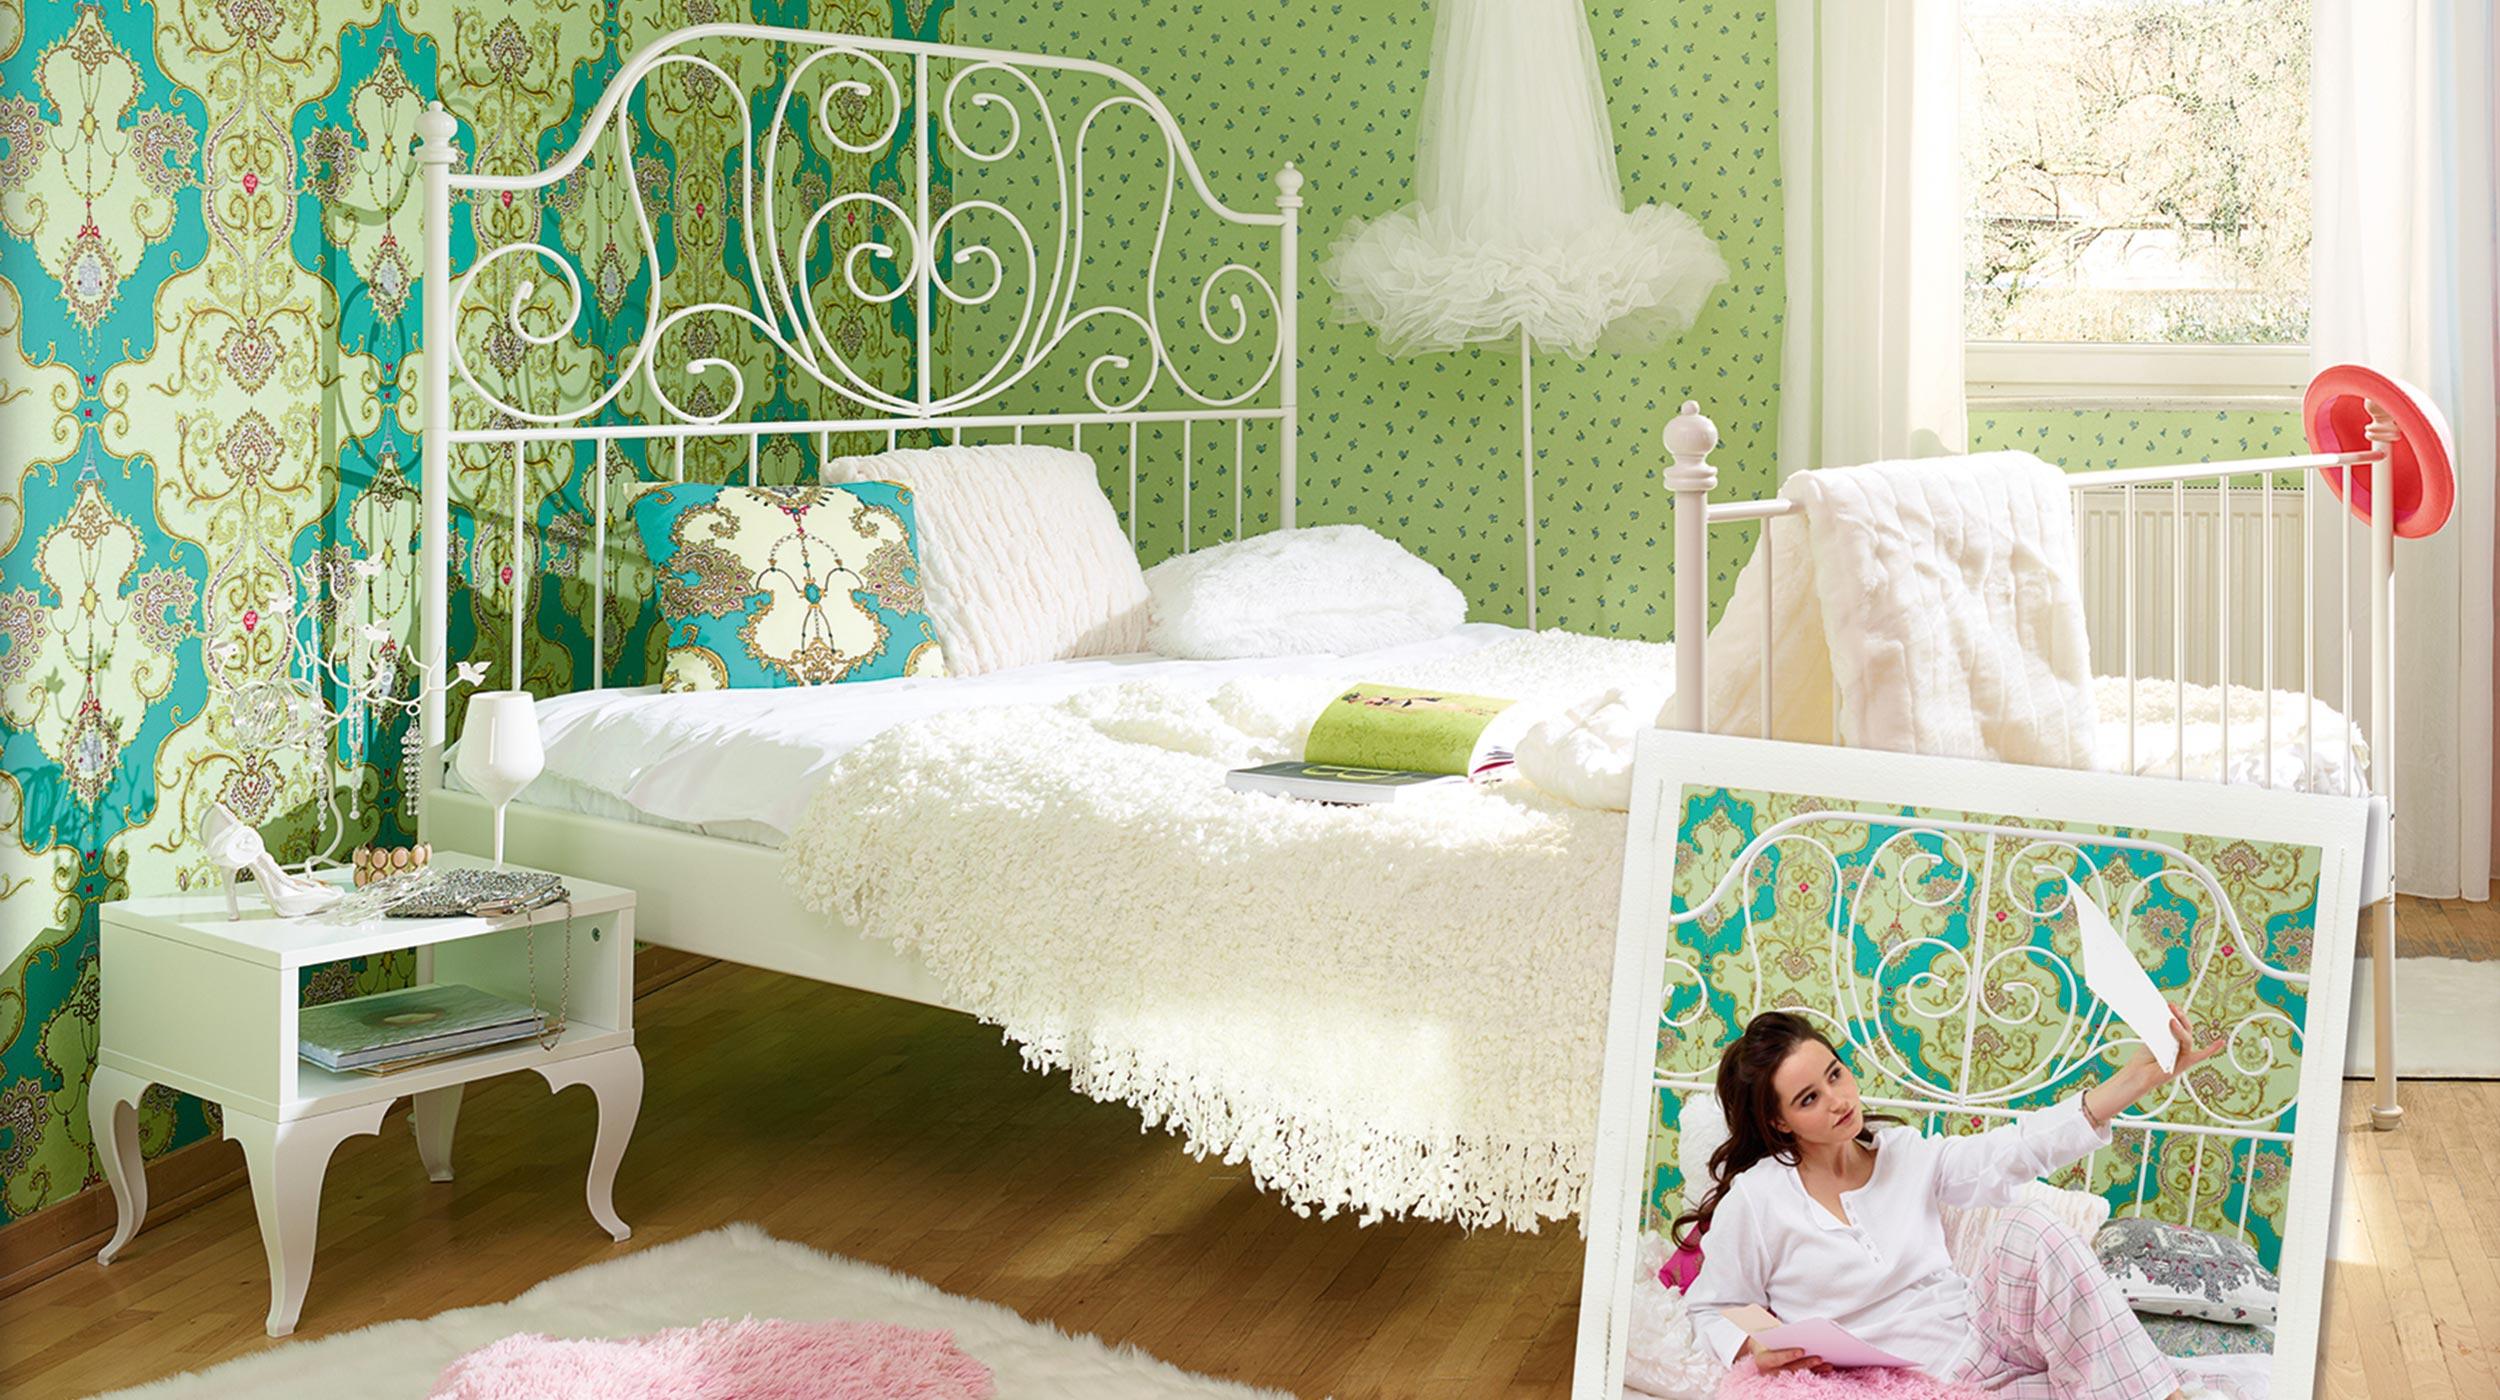 my-life-is-sweet-design-tapete-modern (8).jpg | erismann & cie. gmbh - Modern Tapeten